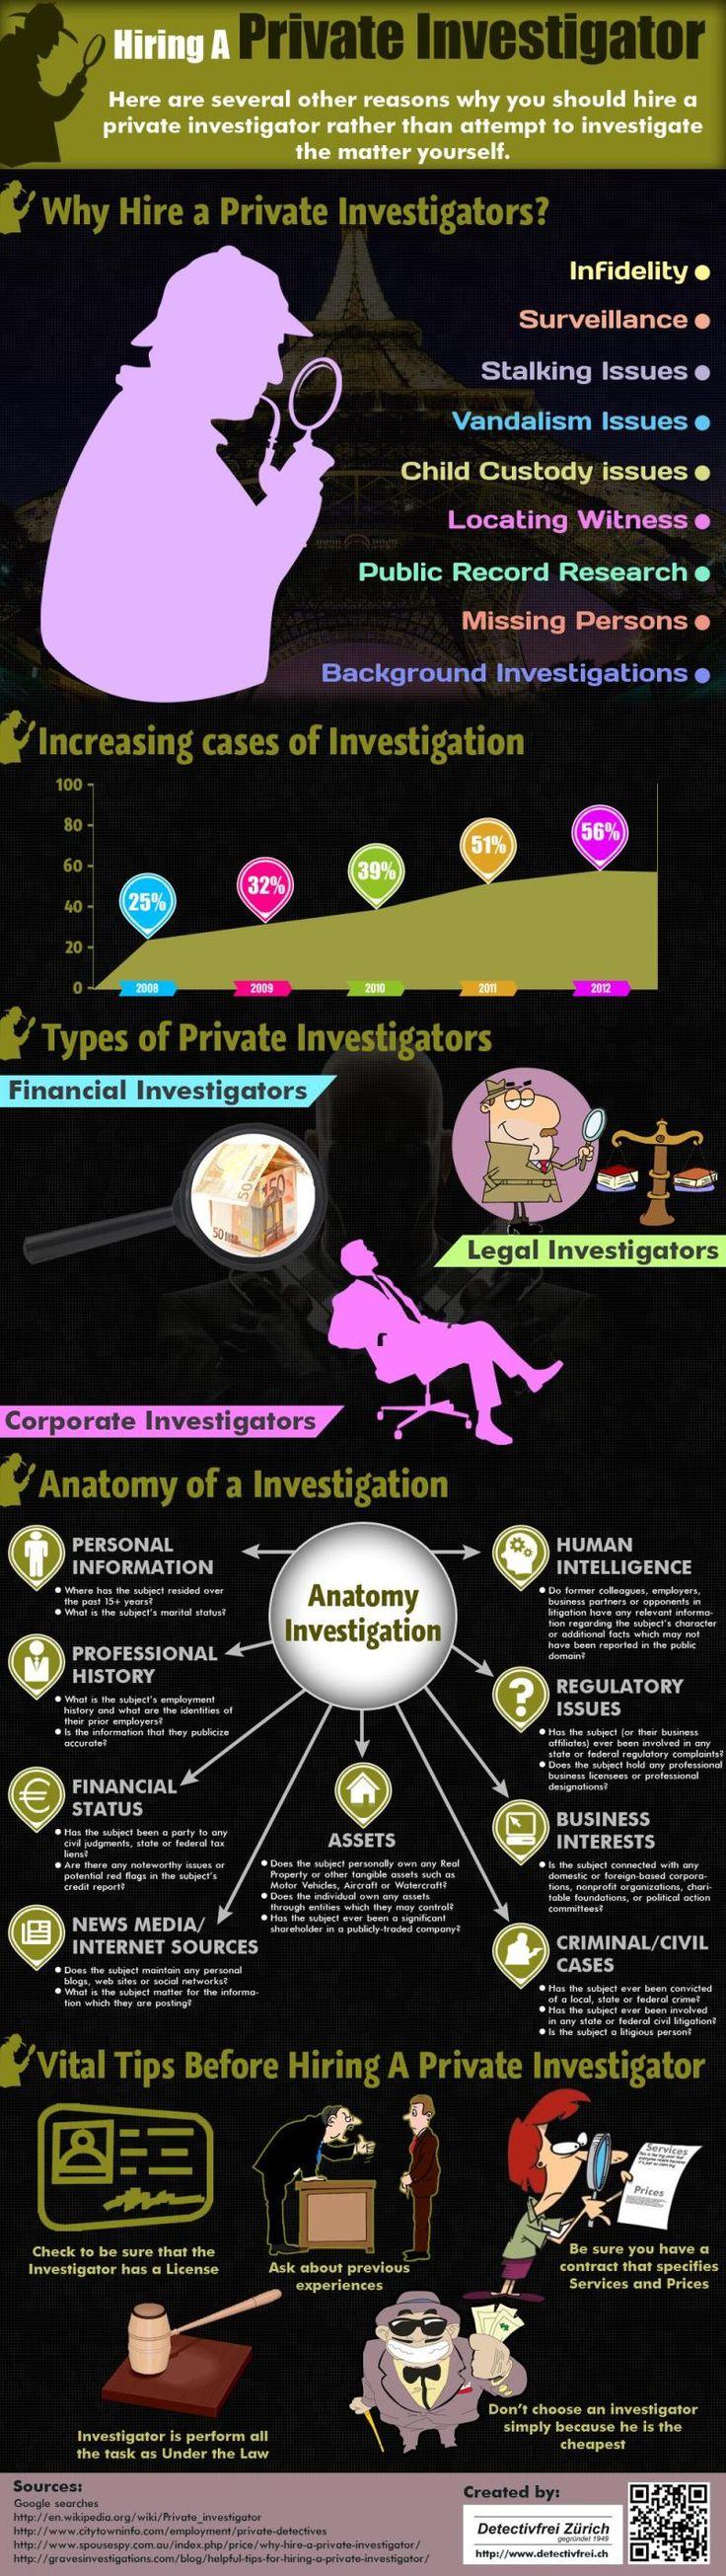 Private Investigator Services in Switzerland